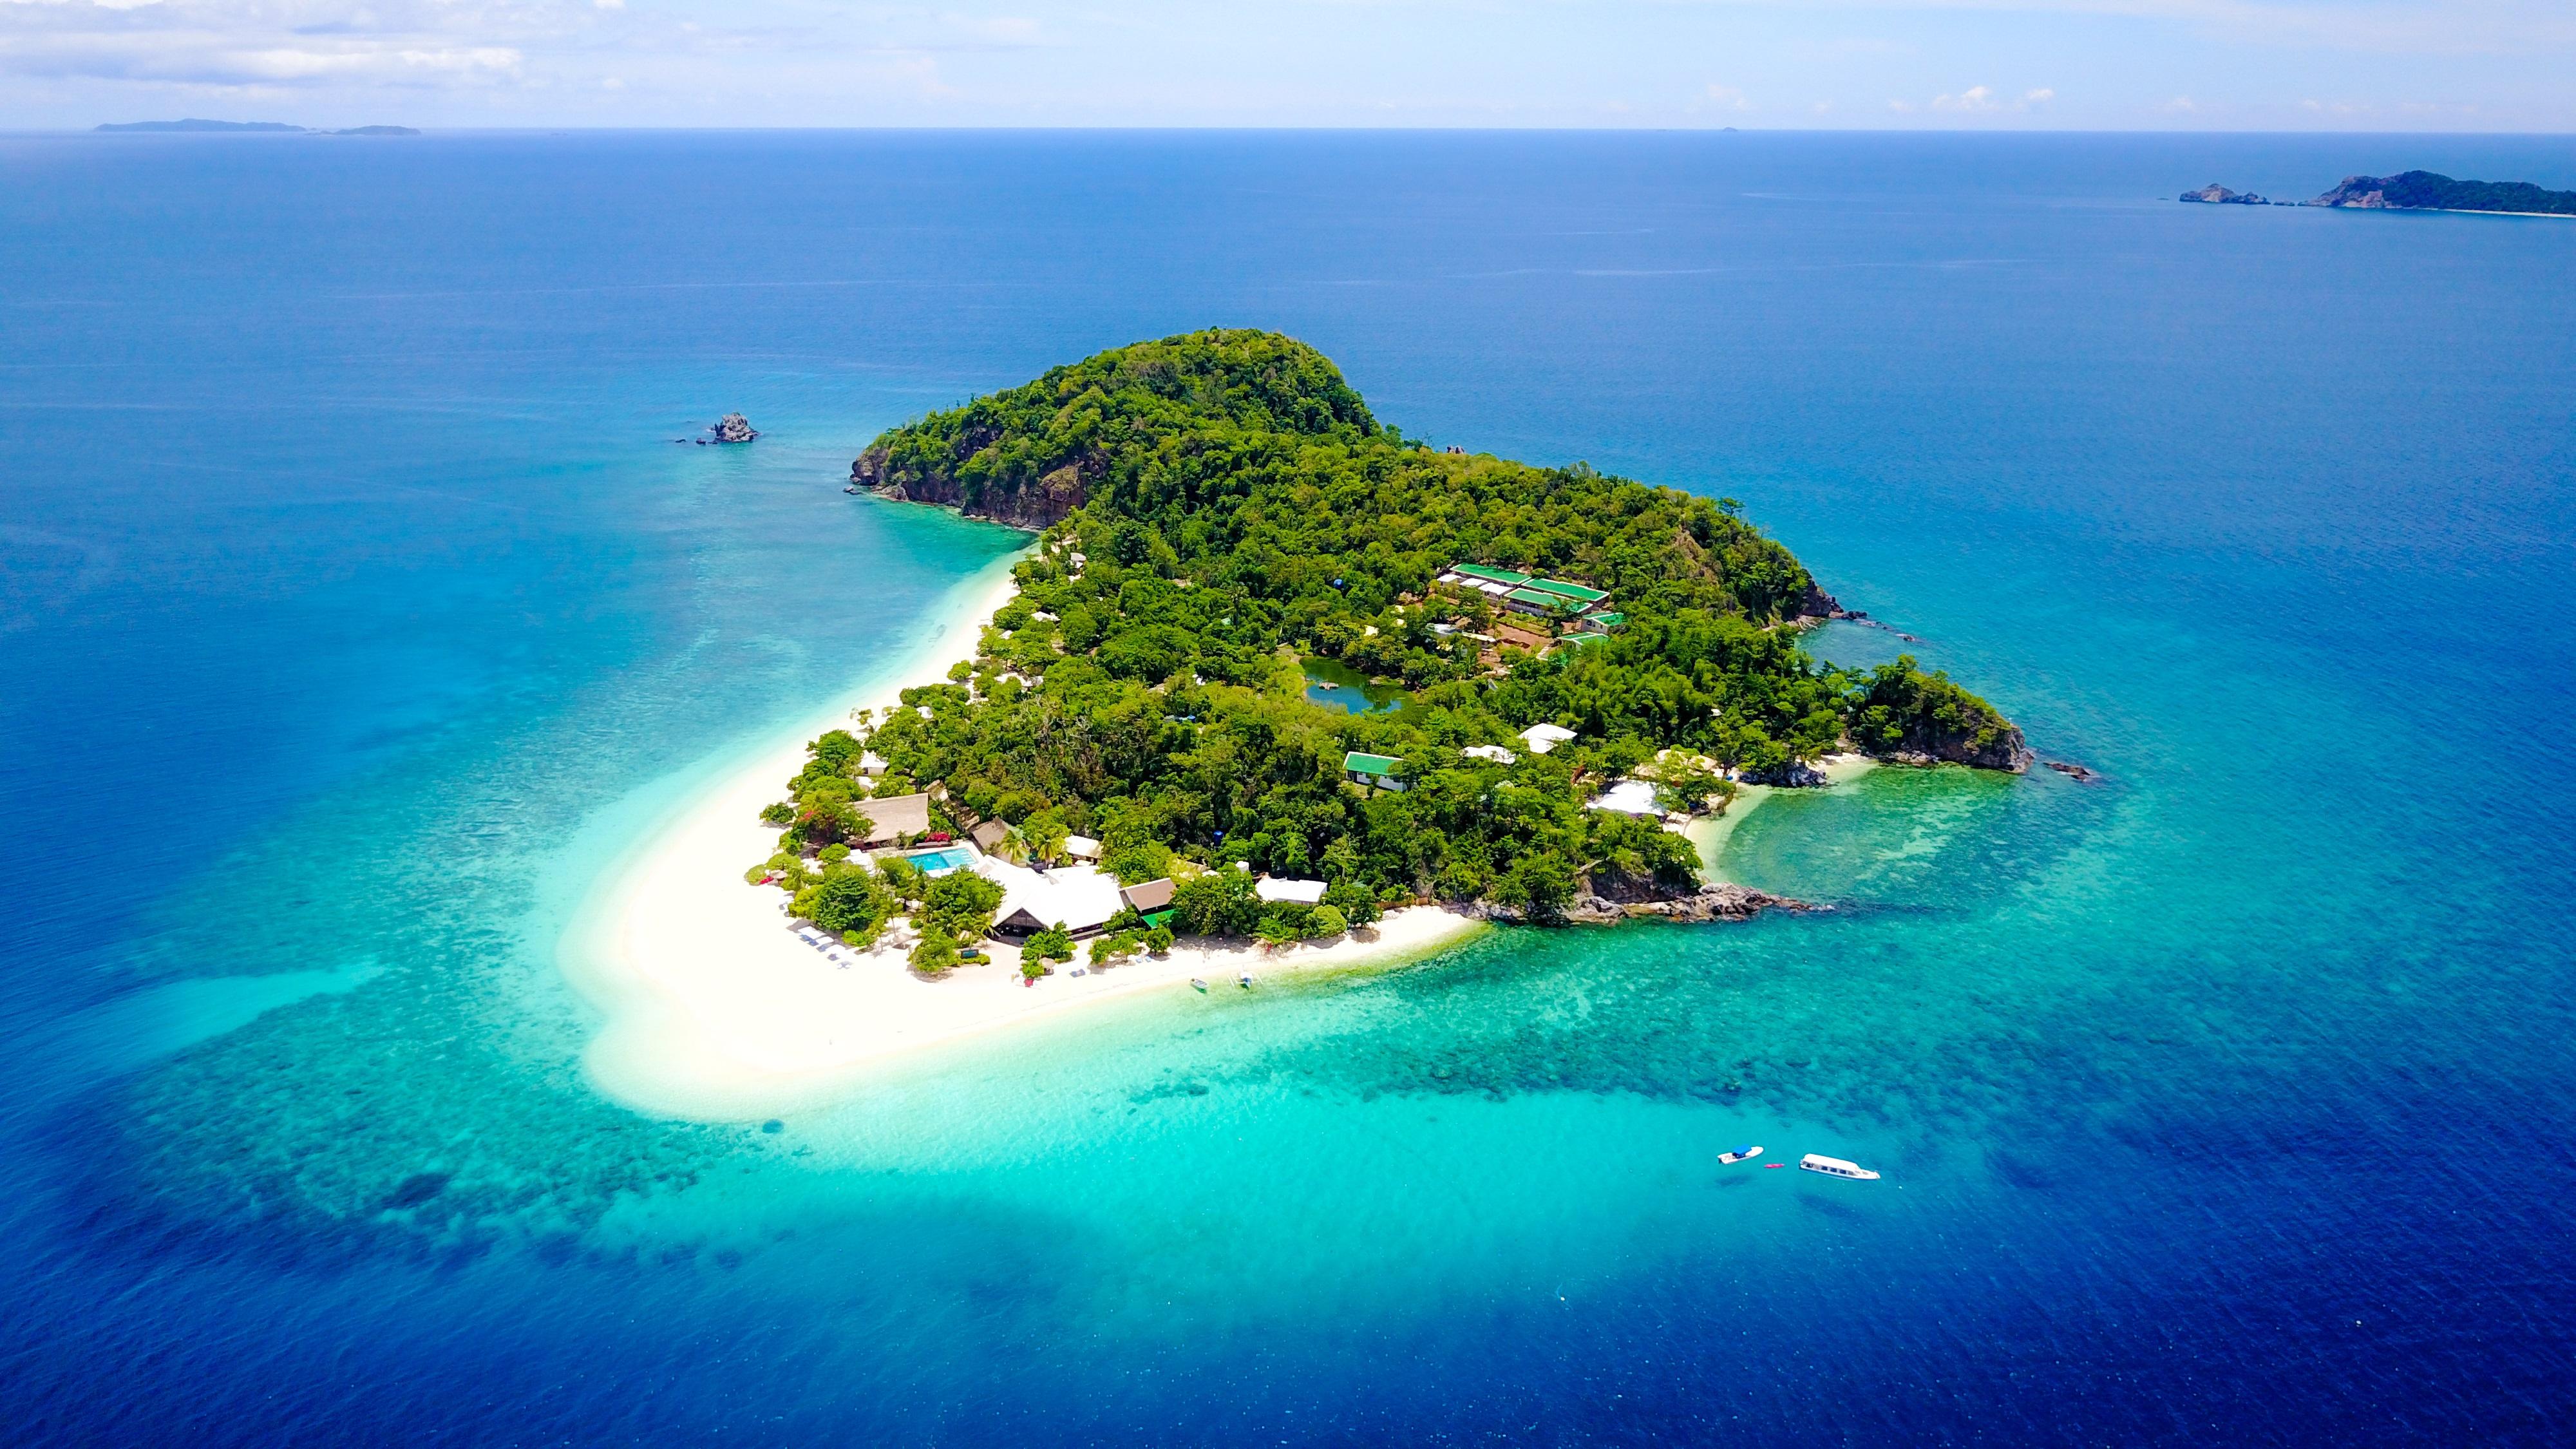 Club Paradise Palawan (private island resort)